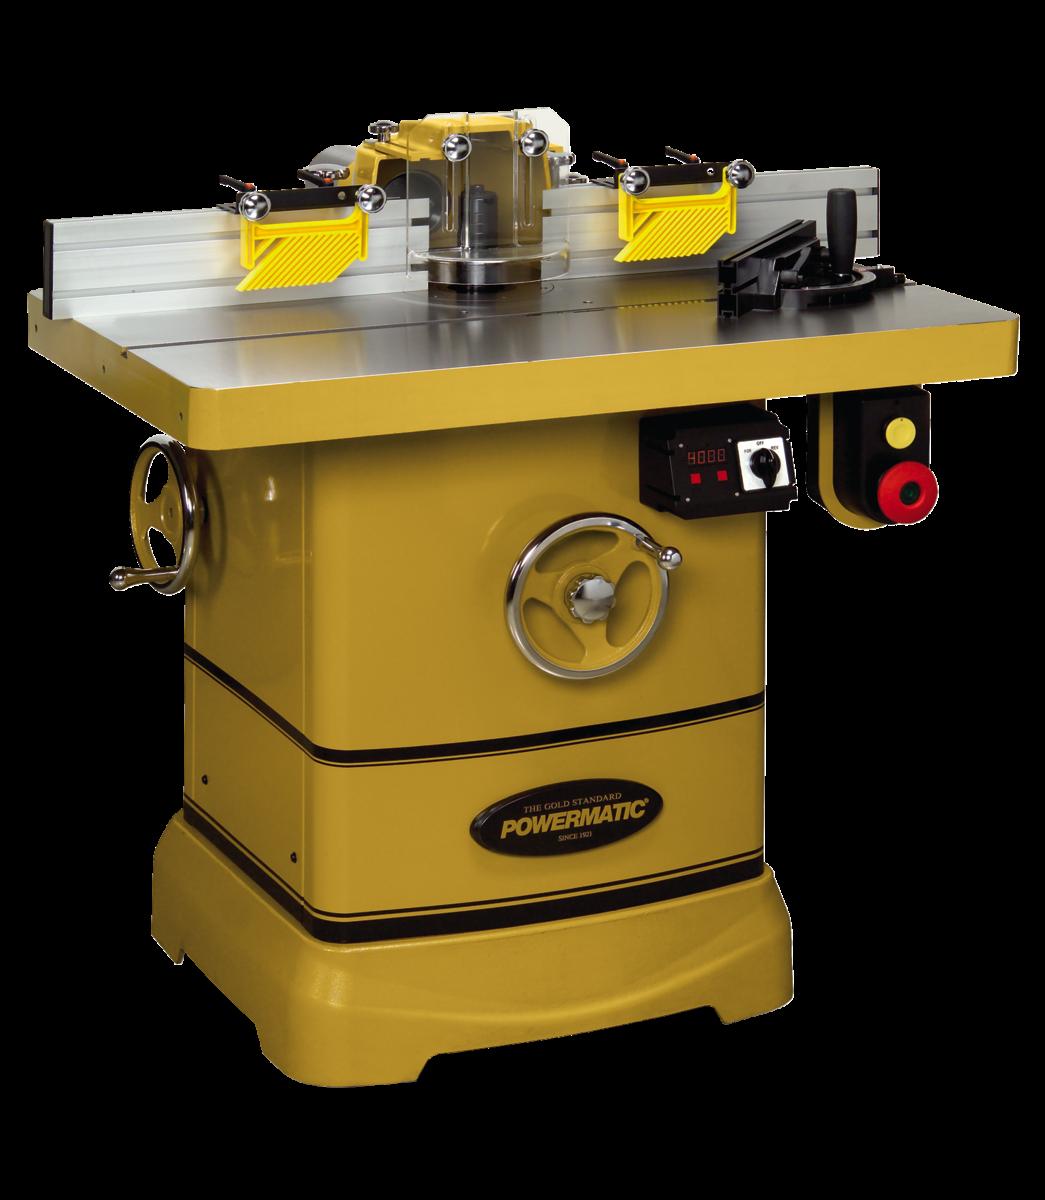 Manual: PM2700 Shaper, 5HP 1PH 230V